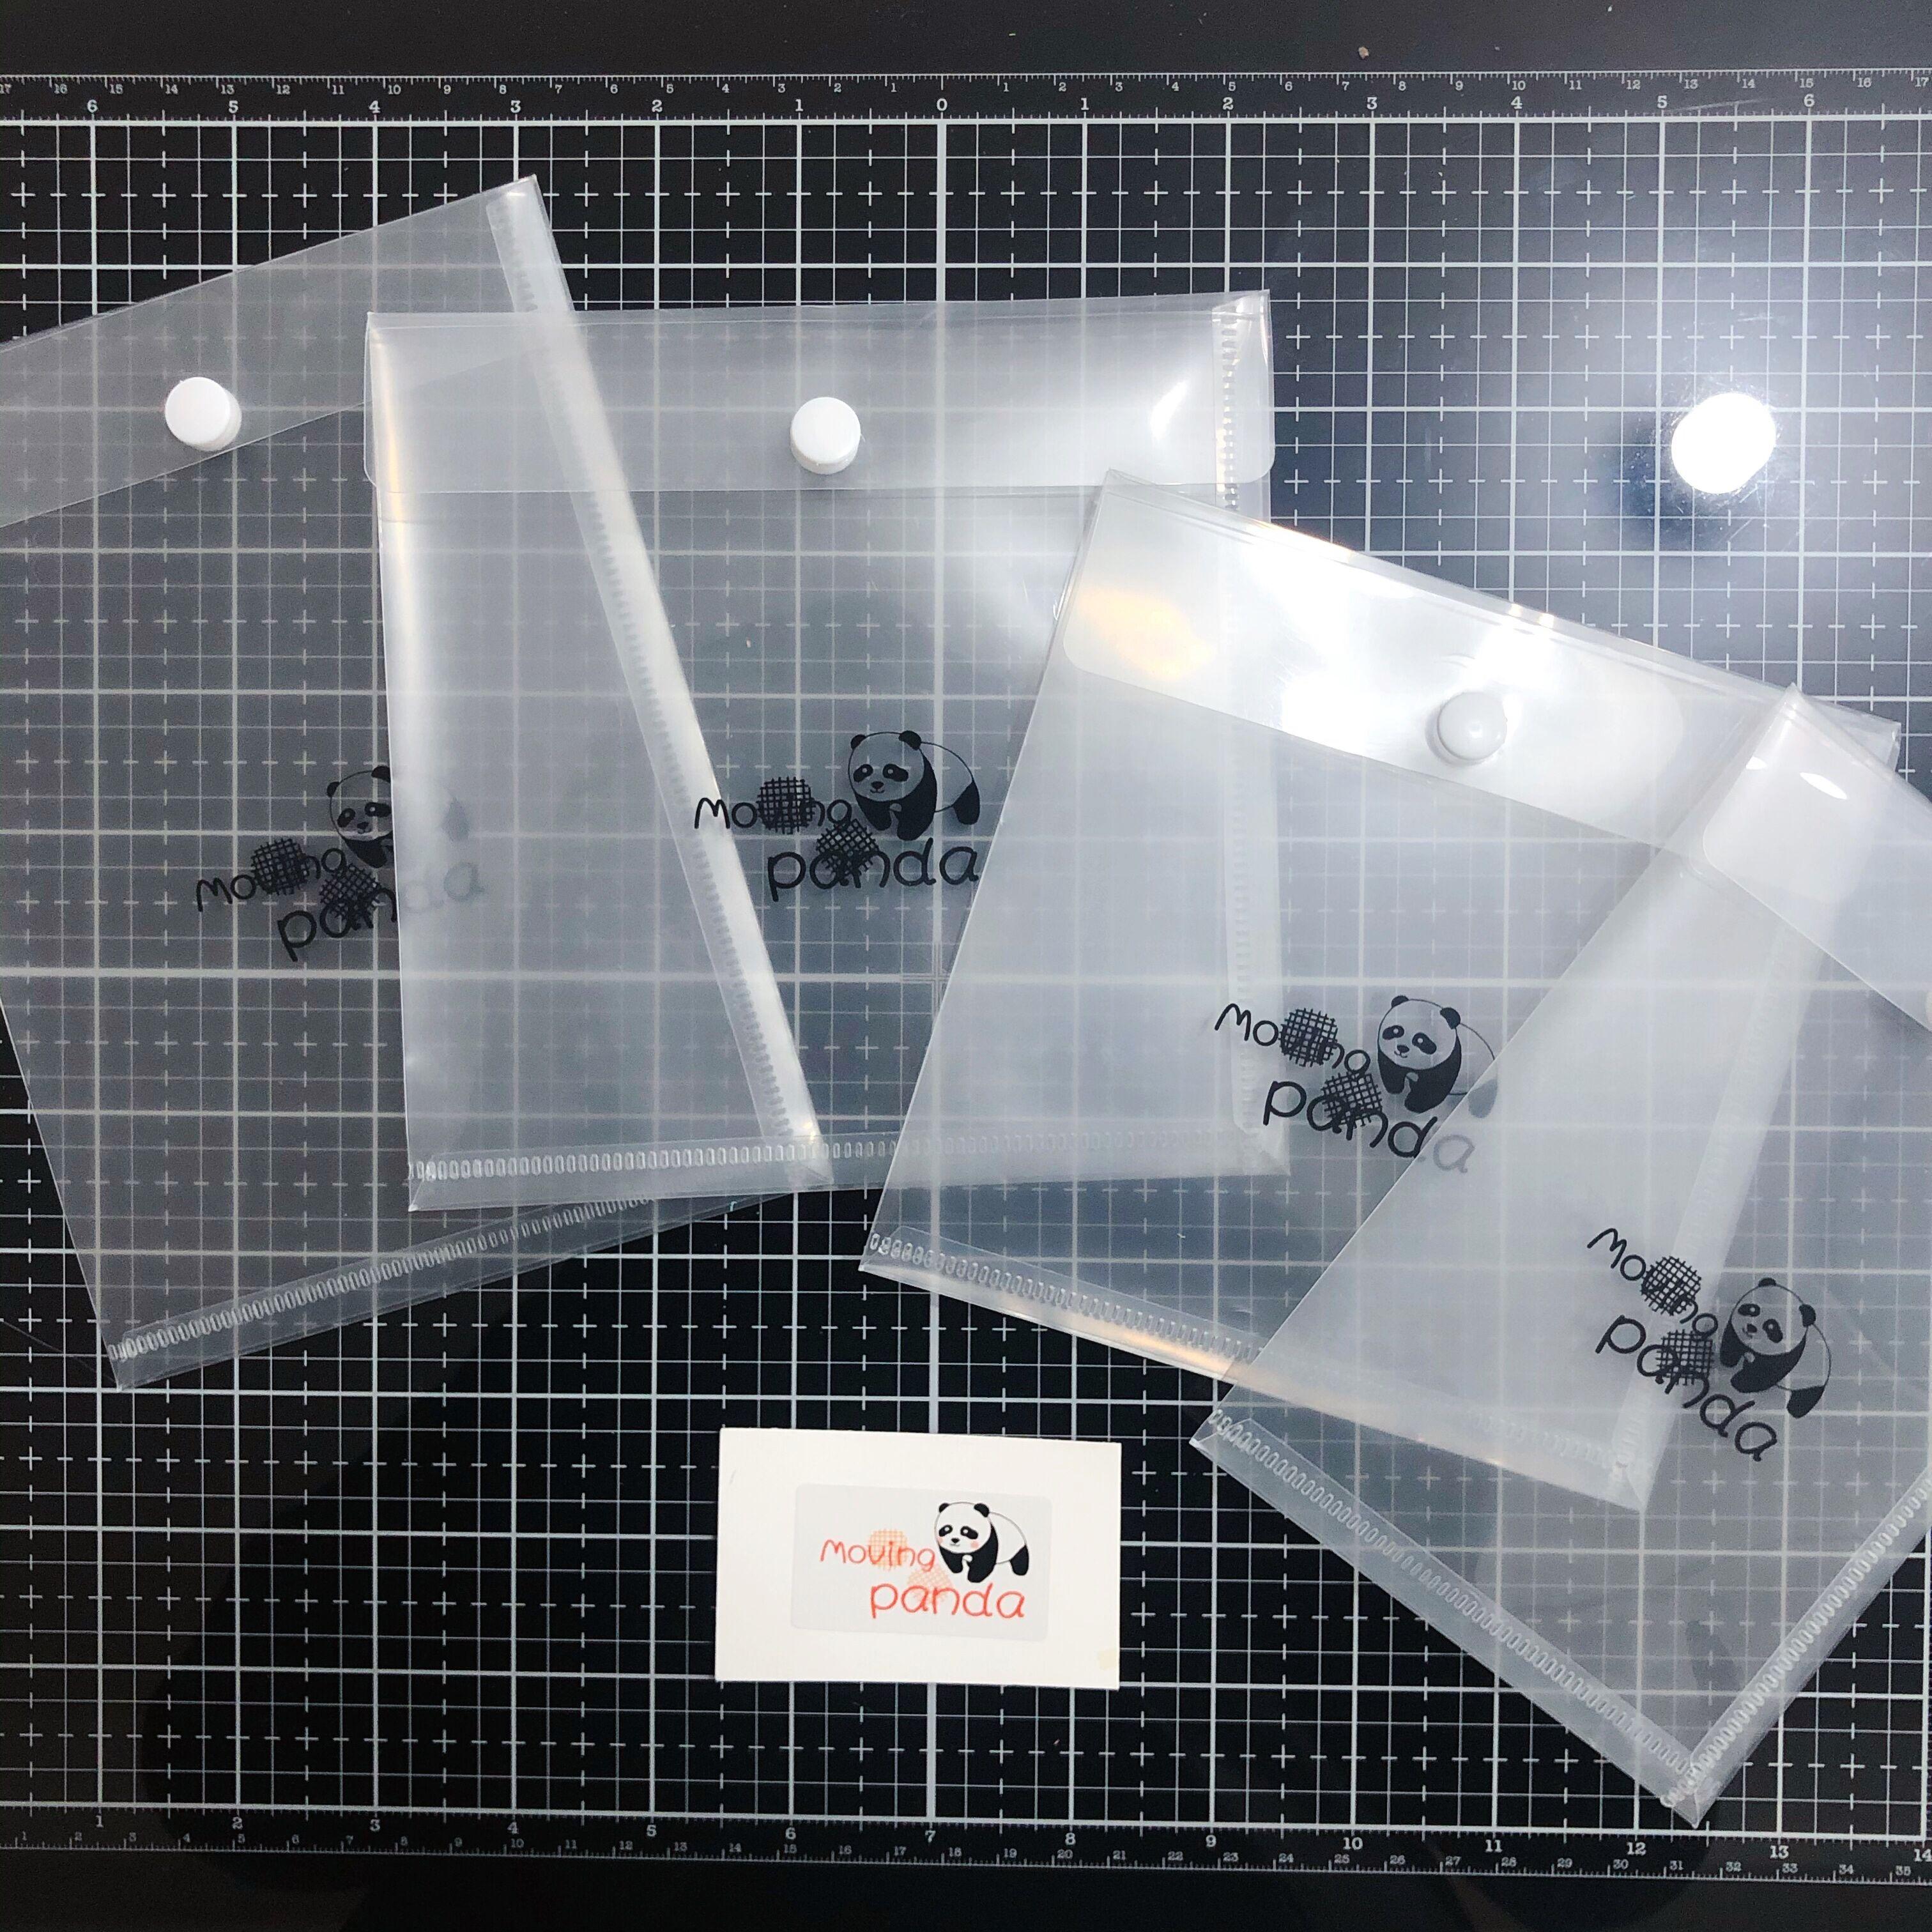 Metal Cutting Dies And Stamps Gathering Bag Resealable DIY Scrapbooking Paper Cards Embossing Cut Dies